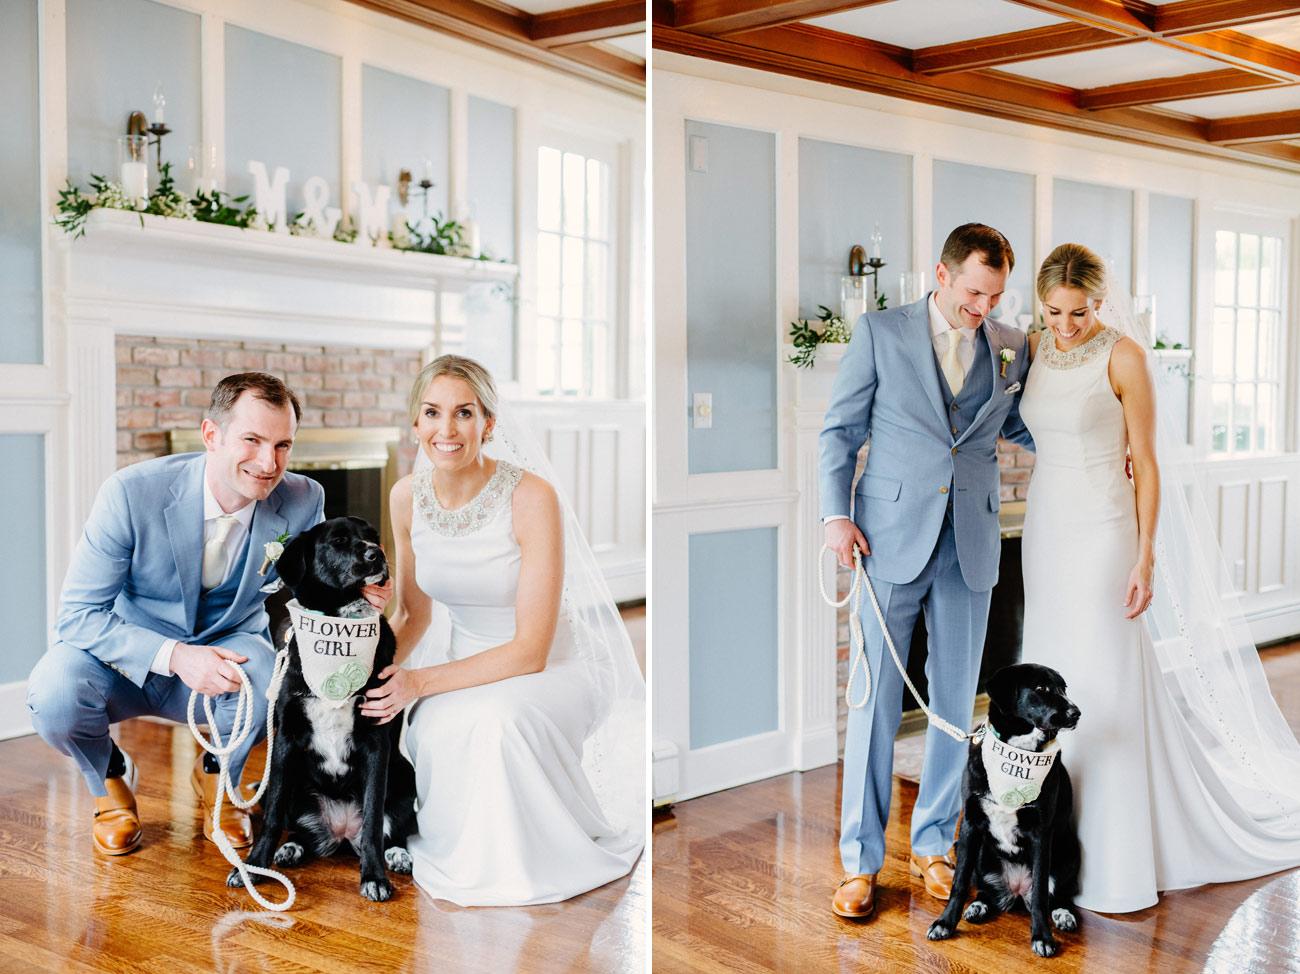 dennis_inn_wedding_mikhail_glabets_15.JPG